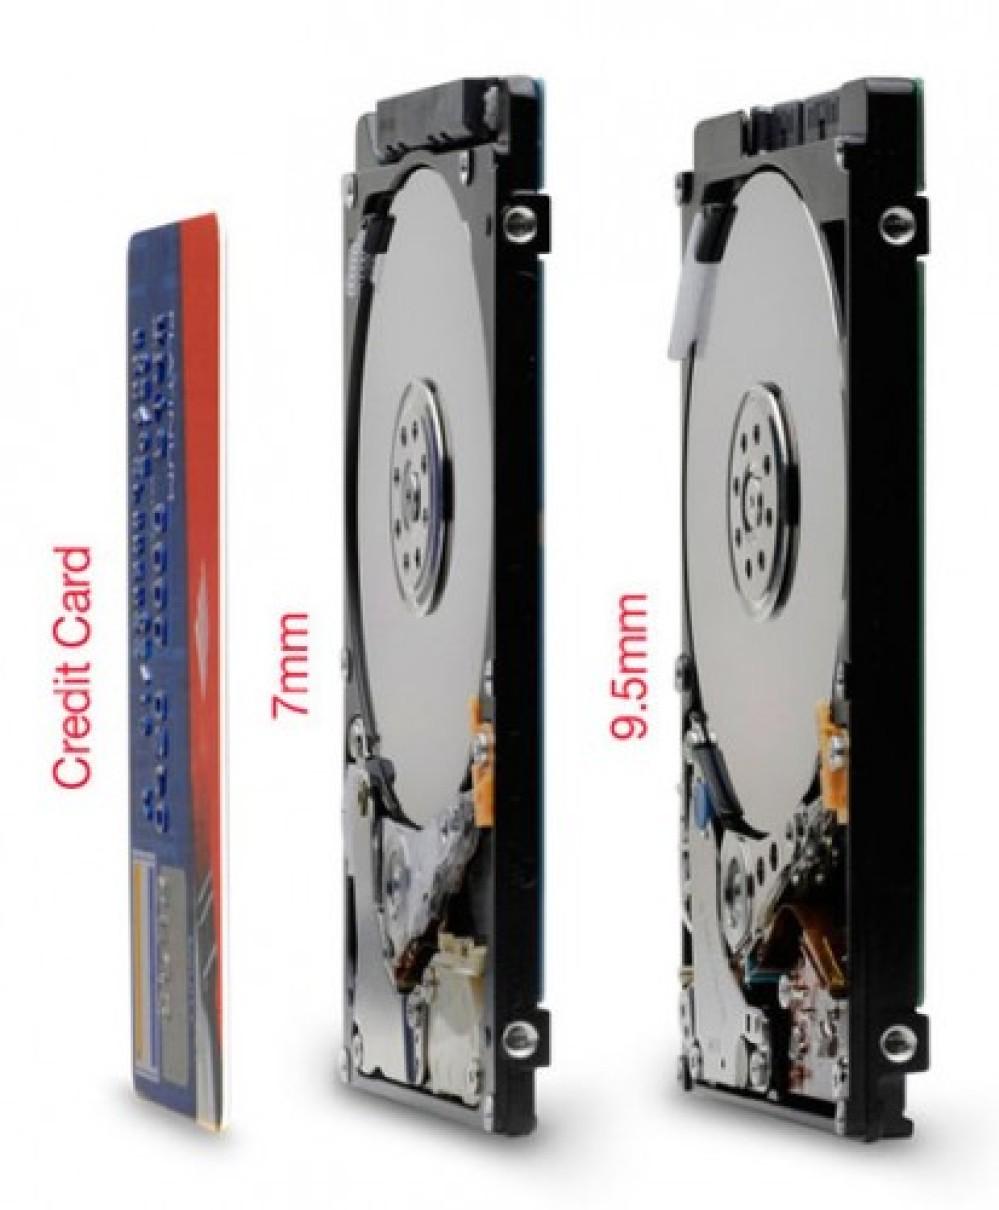 Hitachi Travelstar Z5K500, ο λεπτότερος σκληρός δίσκος στον κόσμο